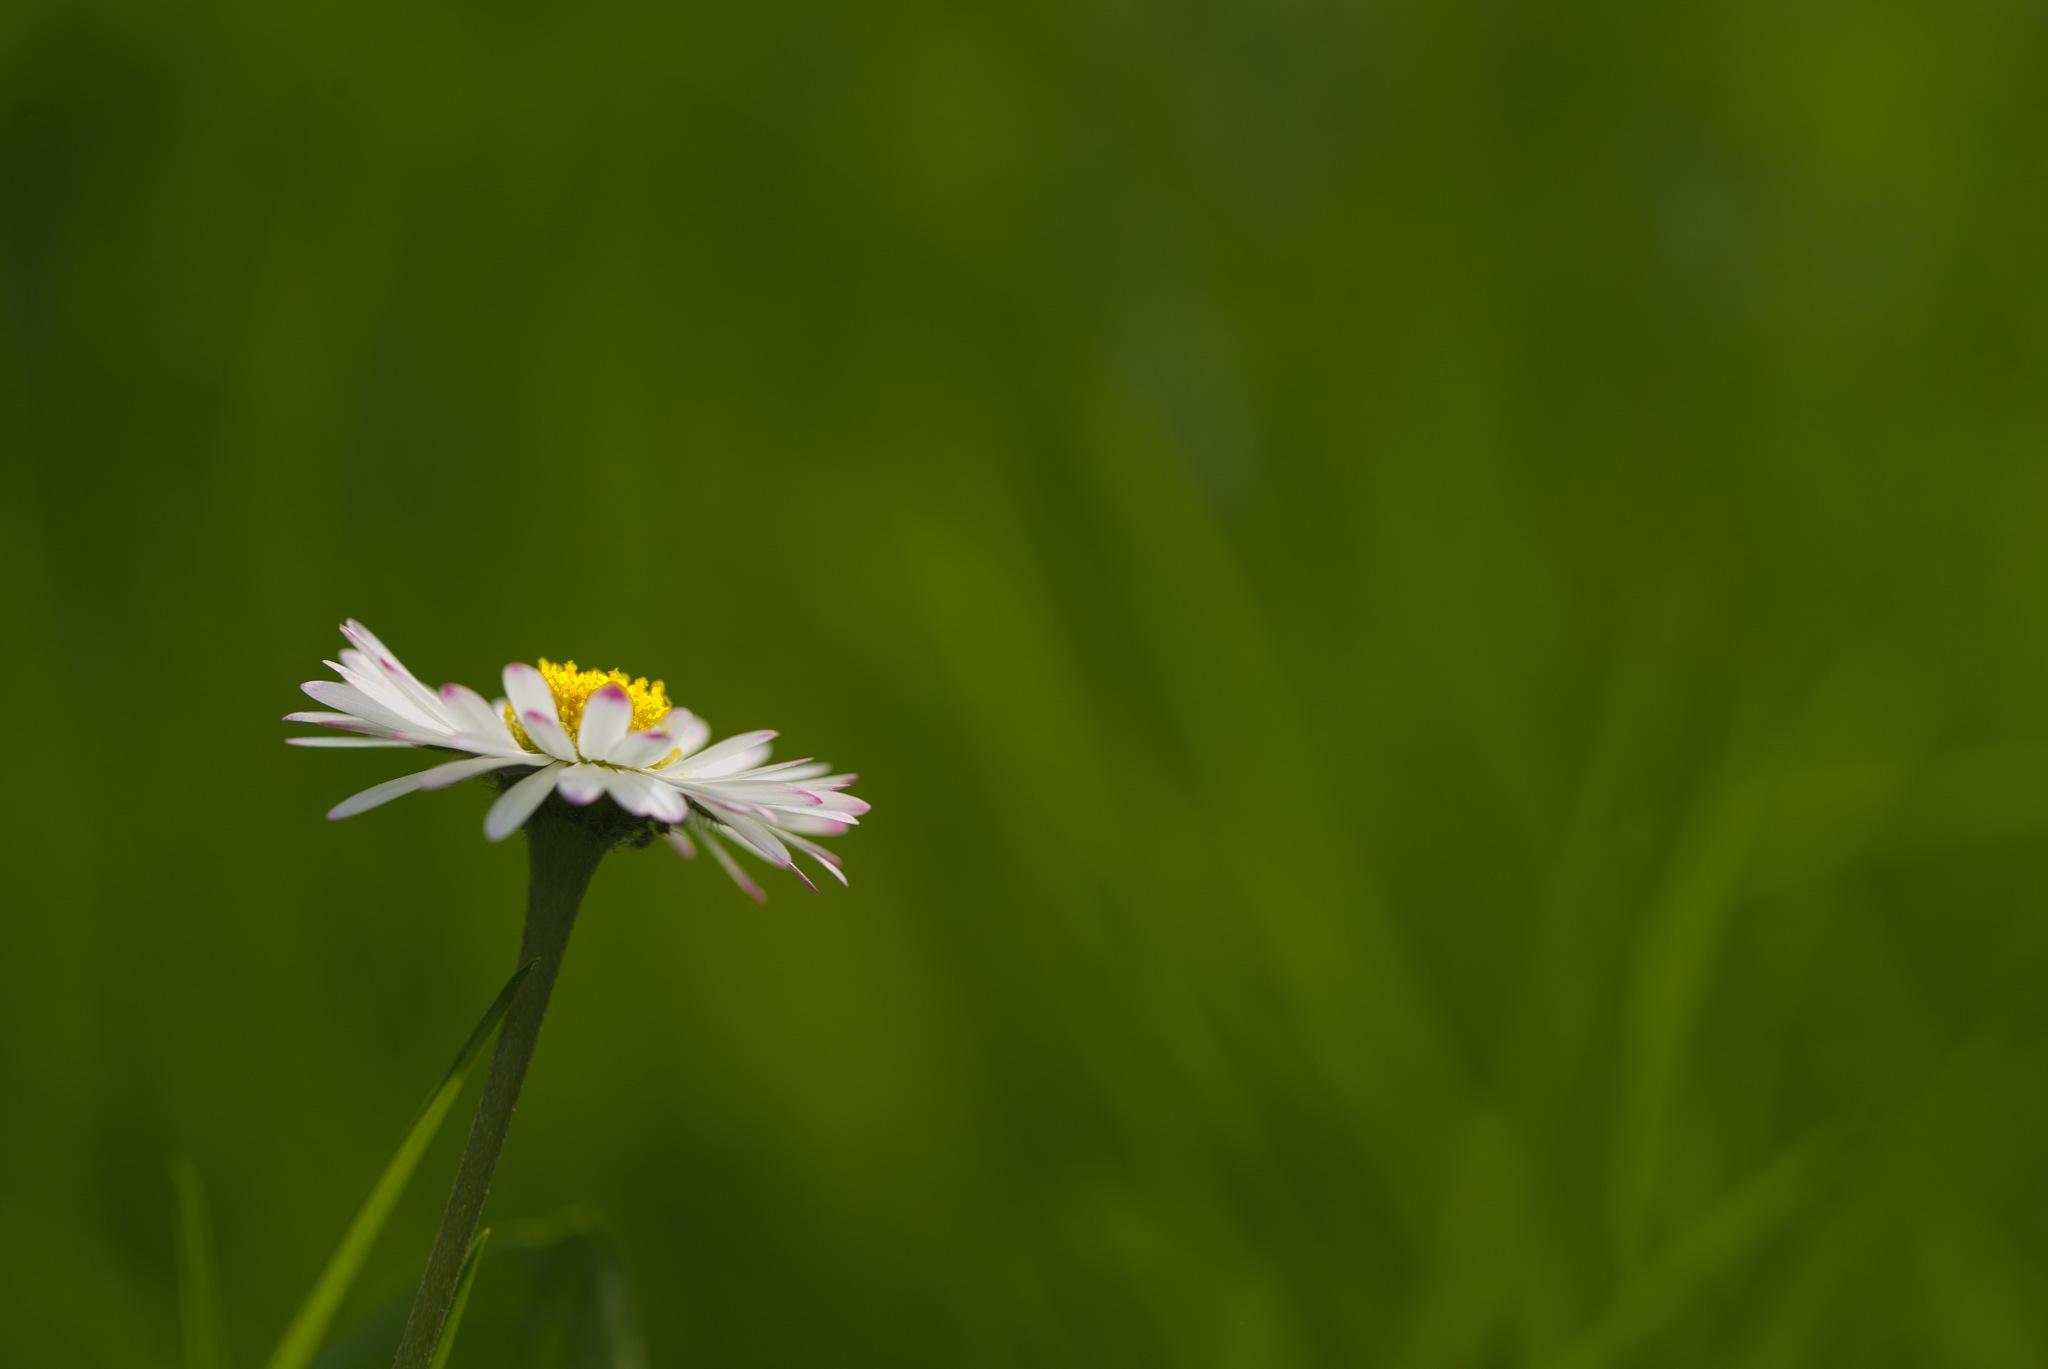 Miss daisy by Jean Michel Segaud